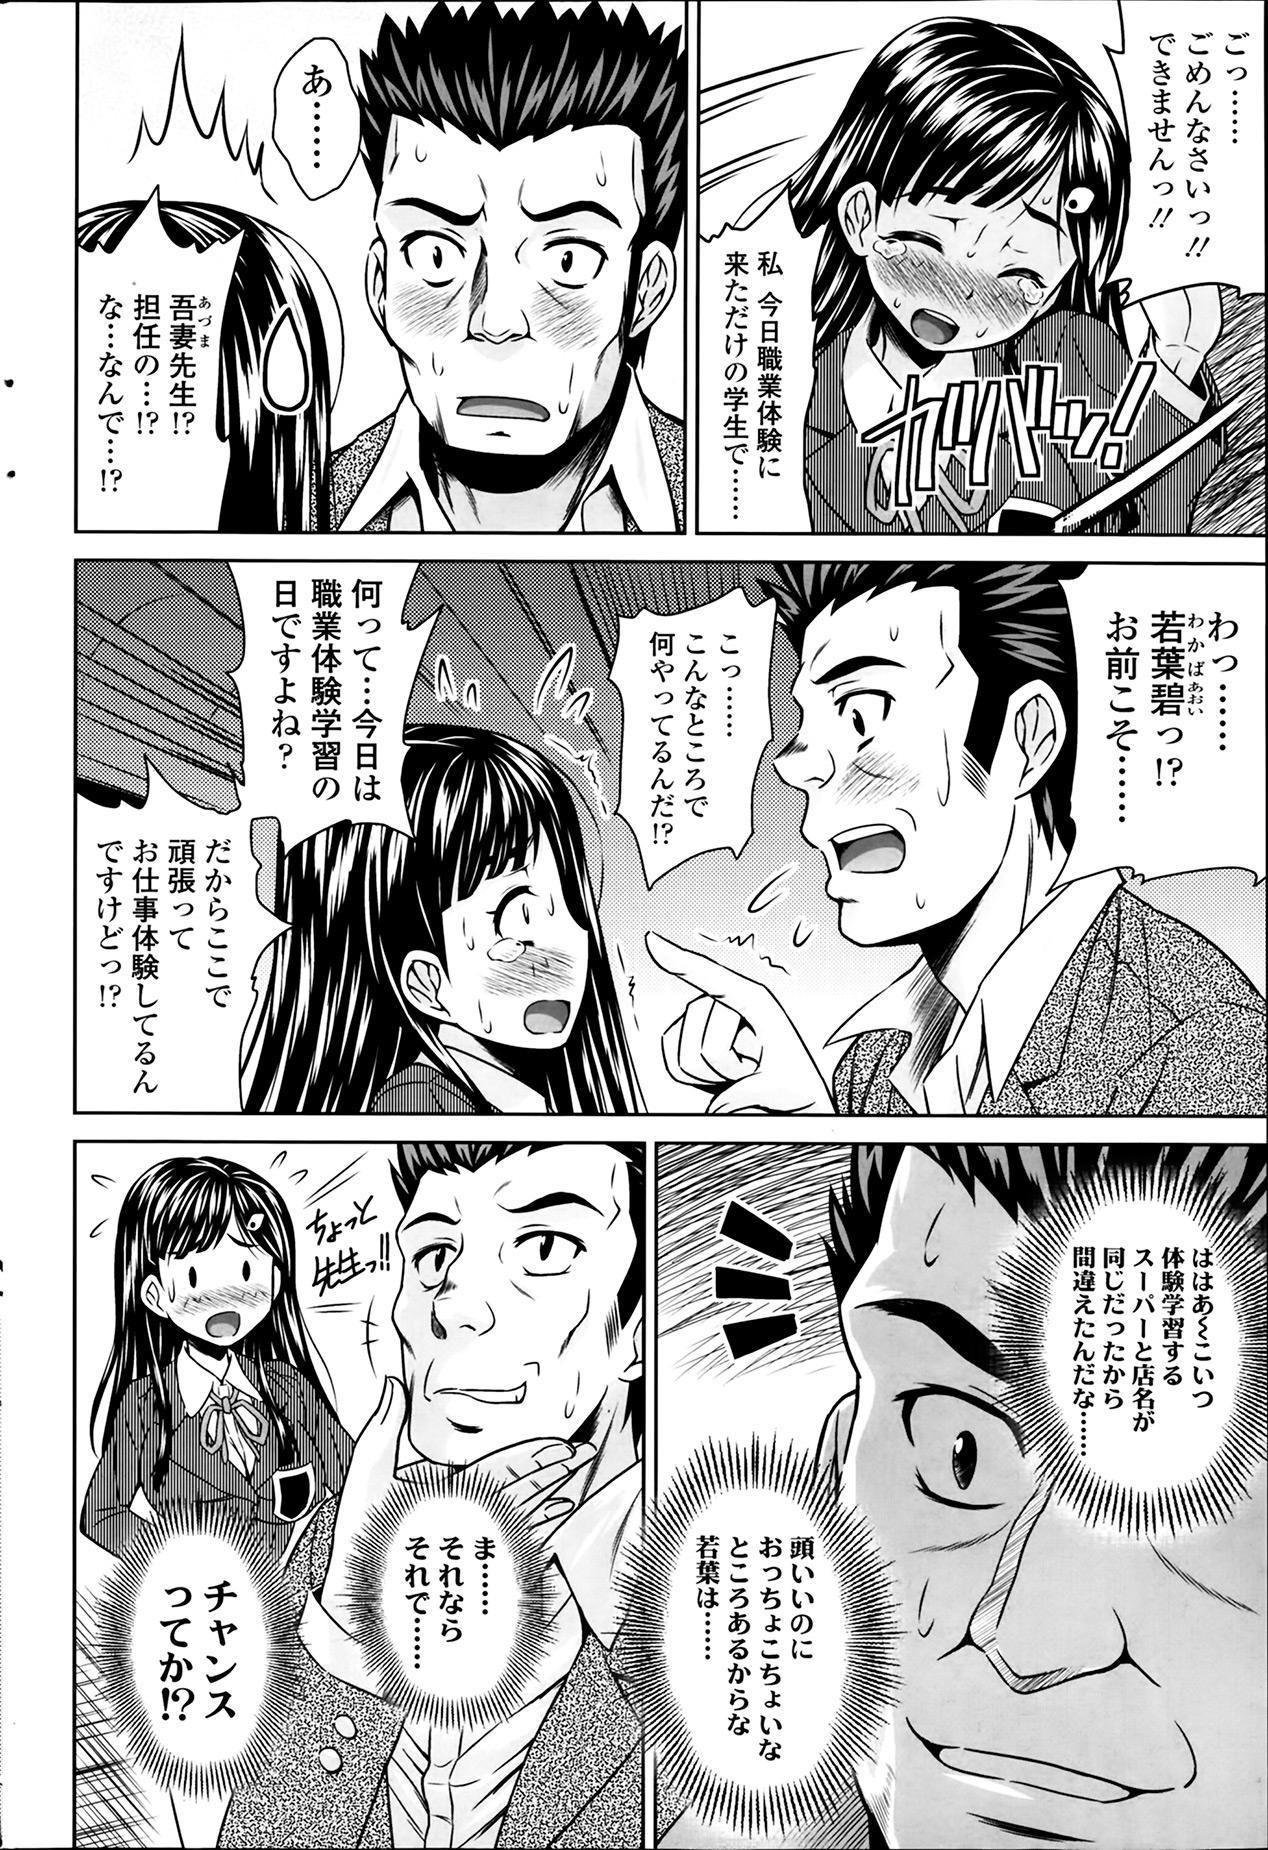 COMIC SIGMA 2014-03 Vol.78 214